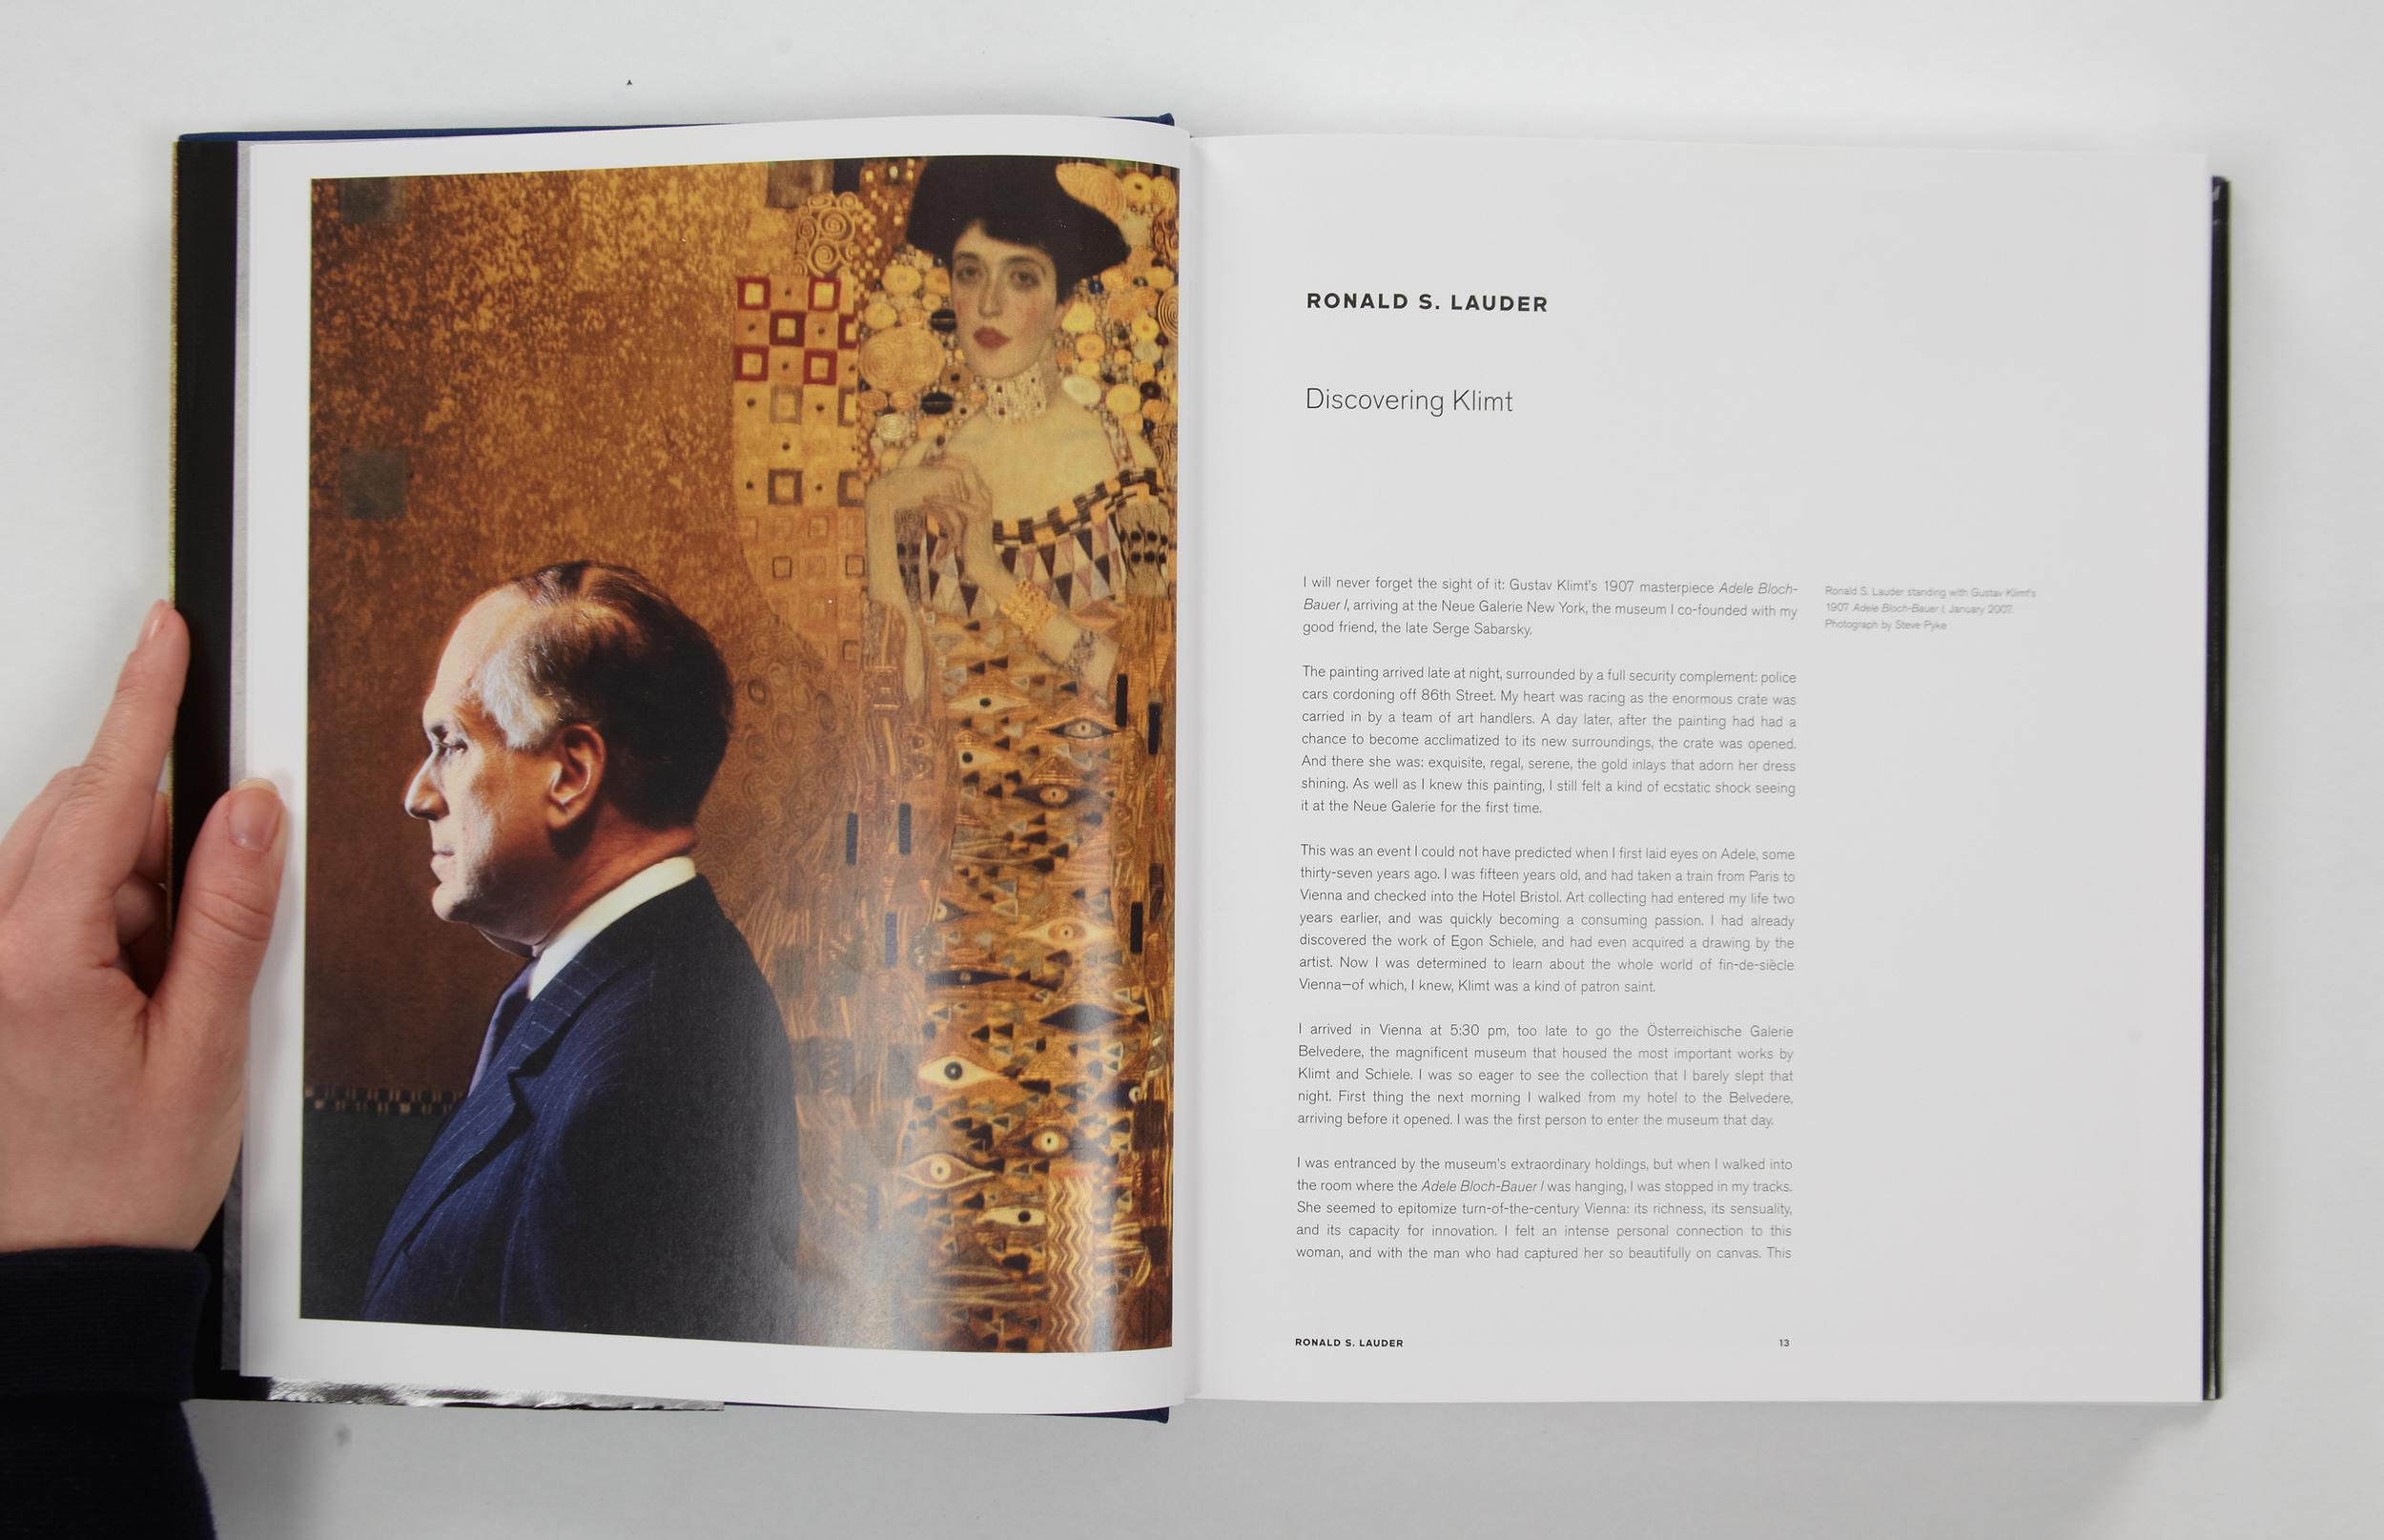 MG_Klimt_bookpost__0002_TSE_Invitations__552.jpg.jpg